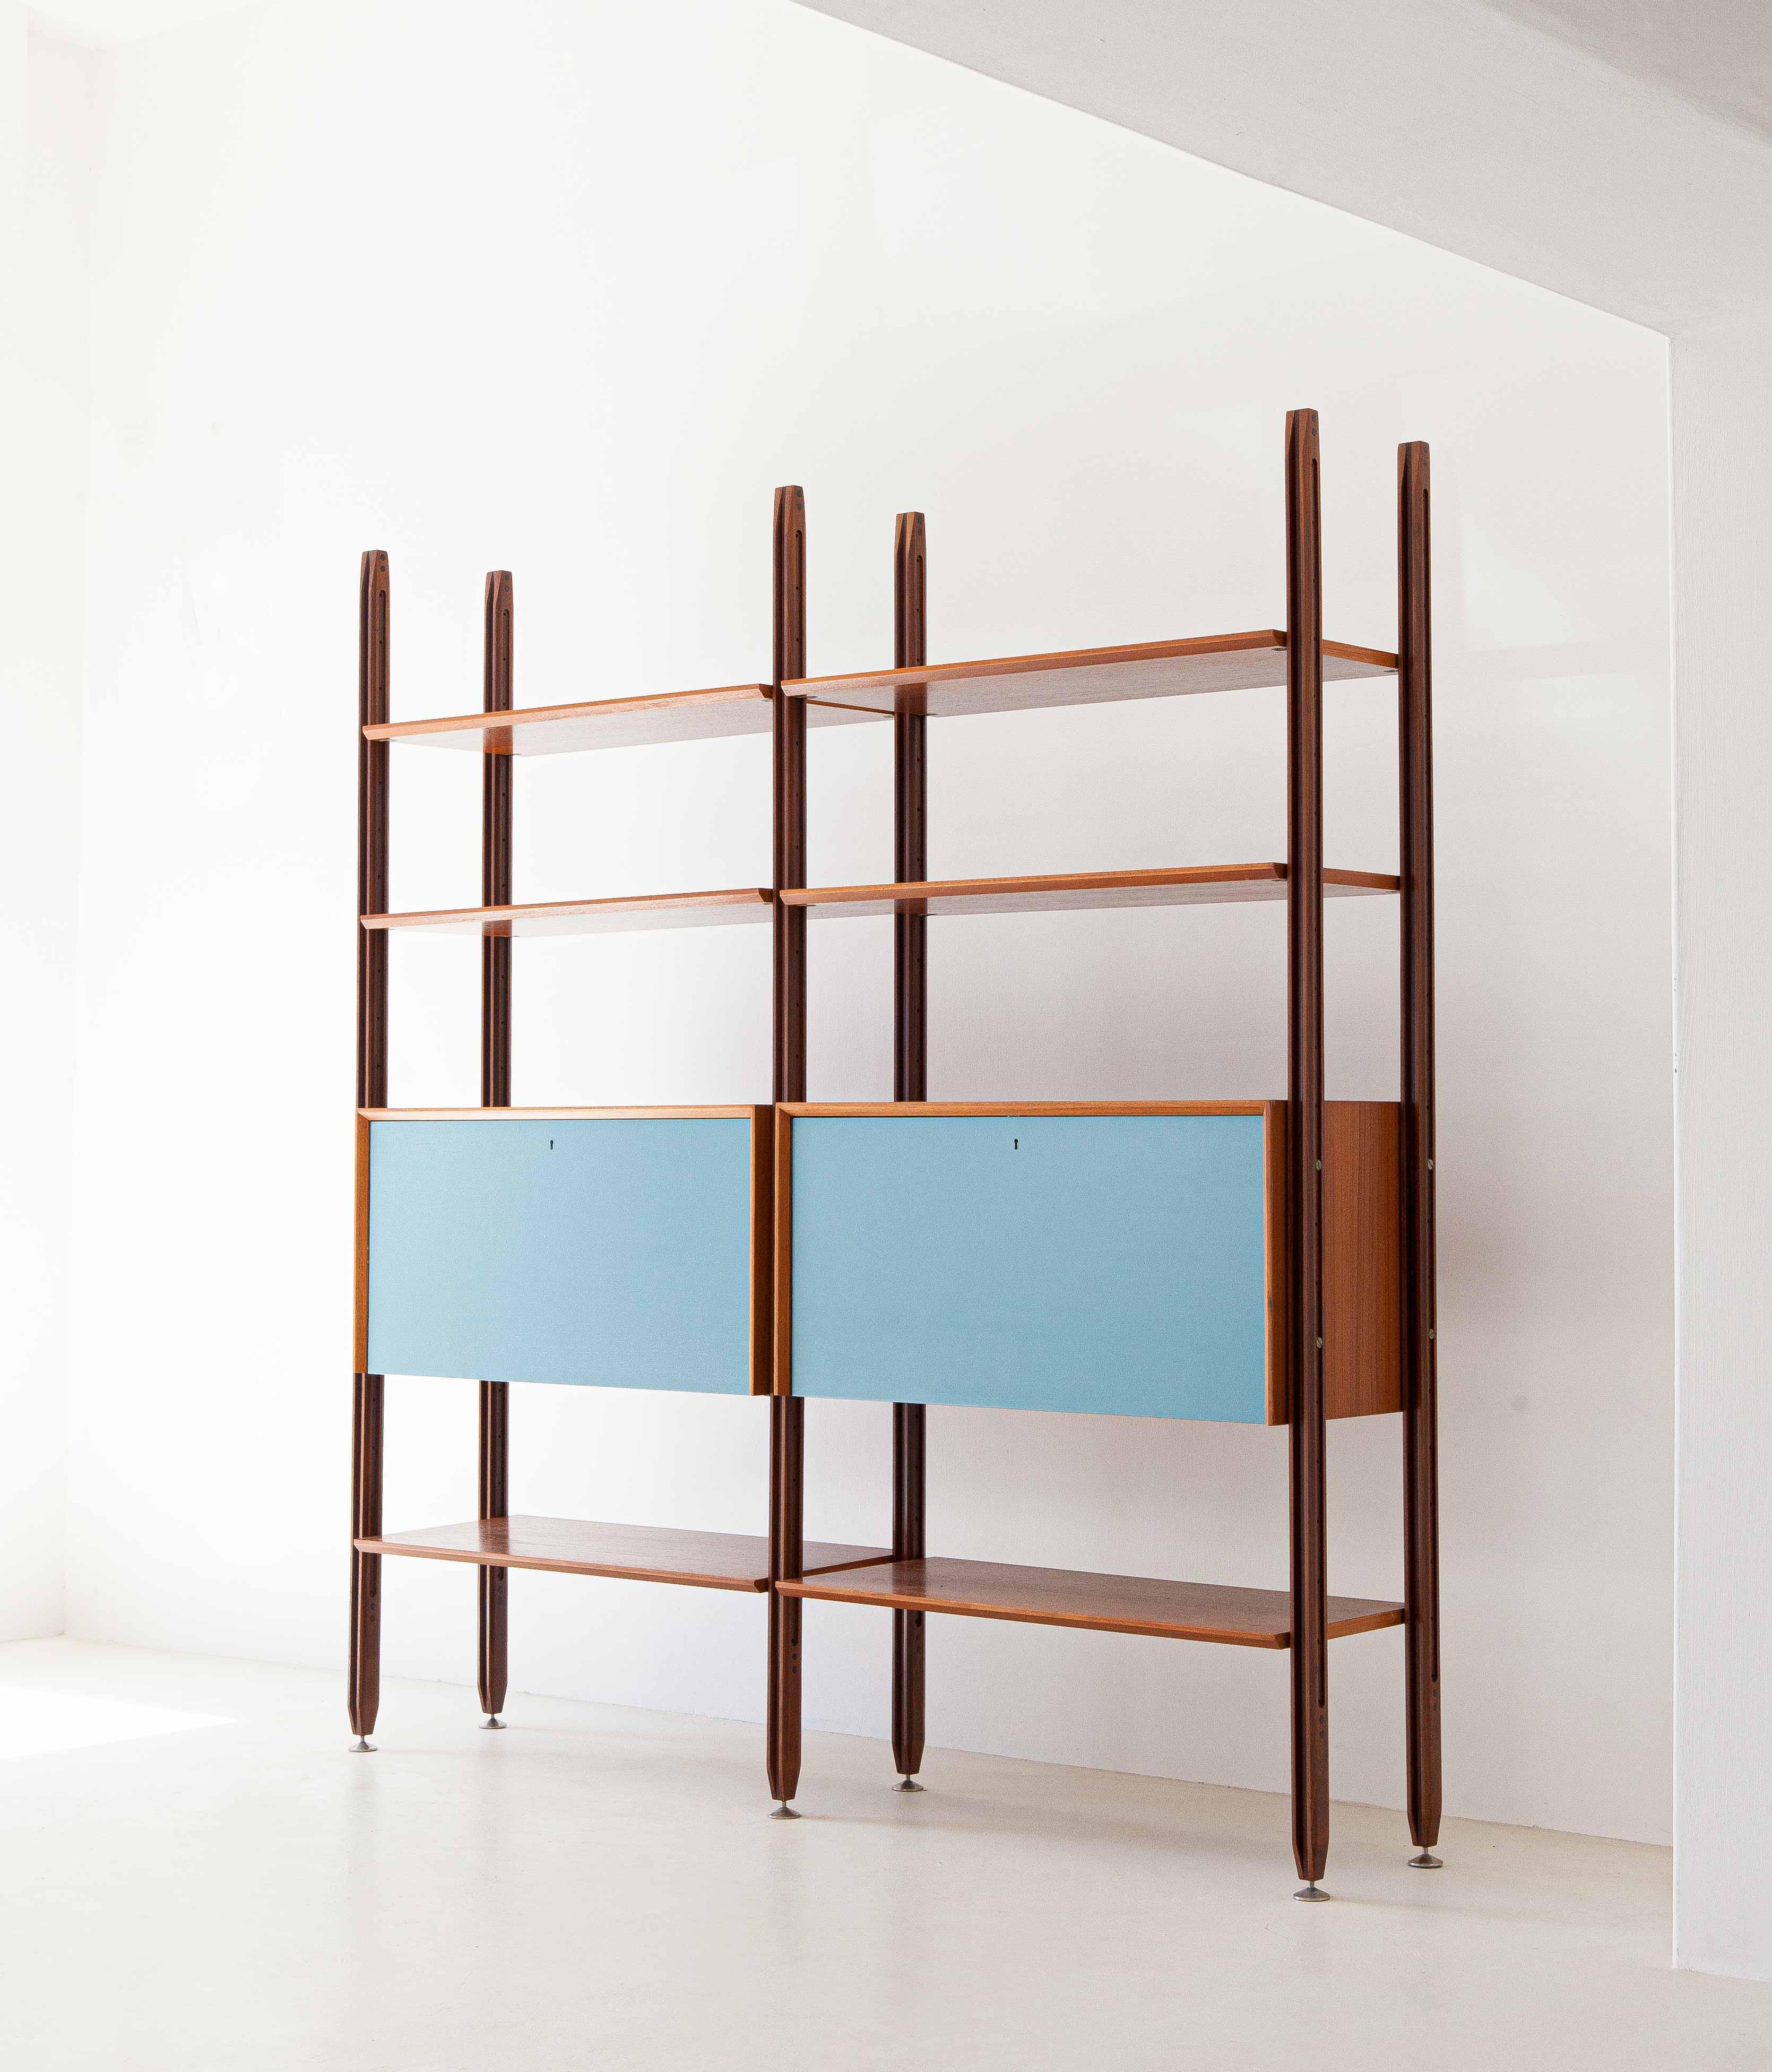 1960s-teak-bookshelf-with-light-blue-doors-1-WU38